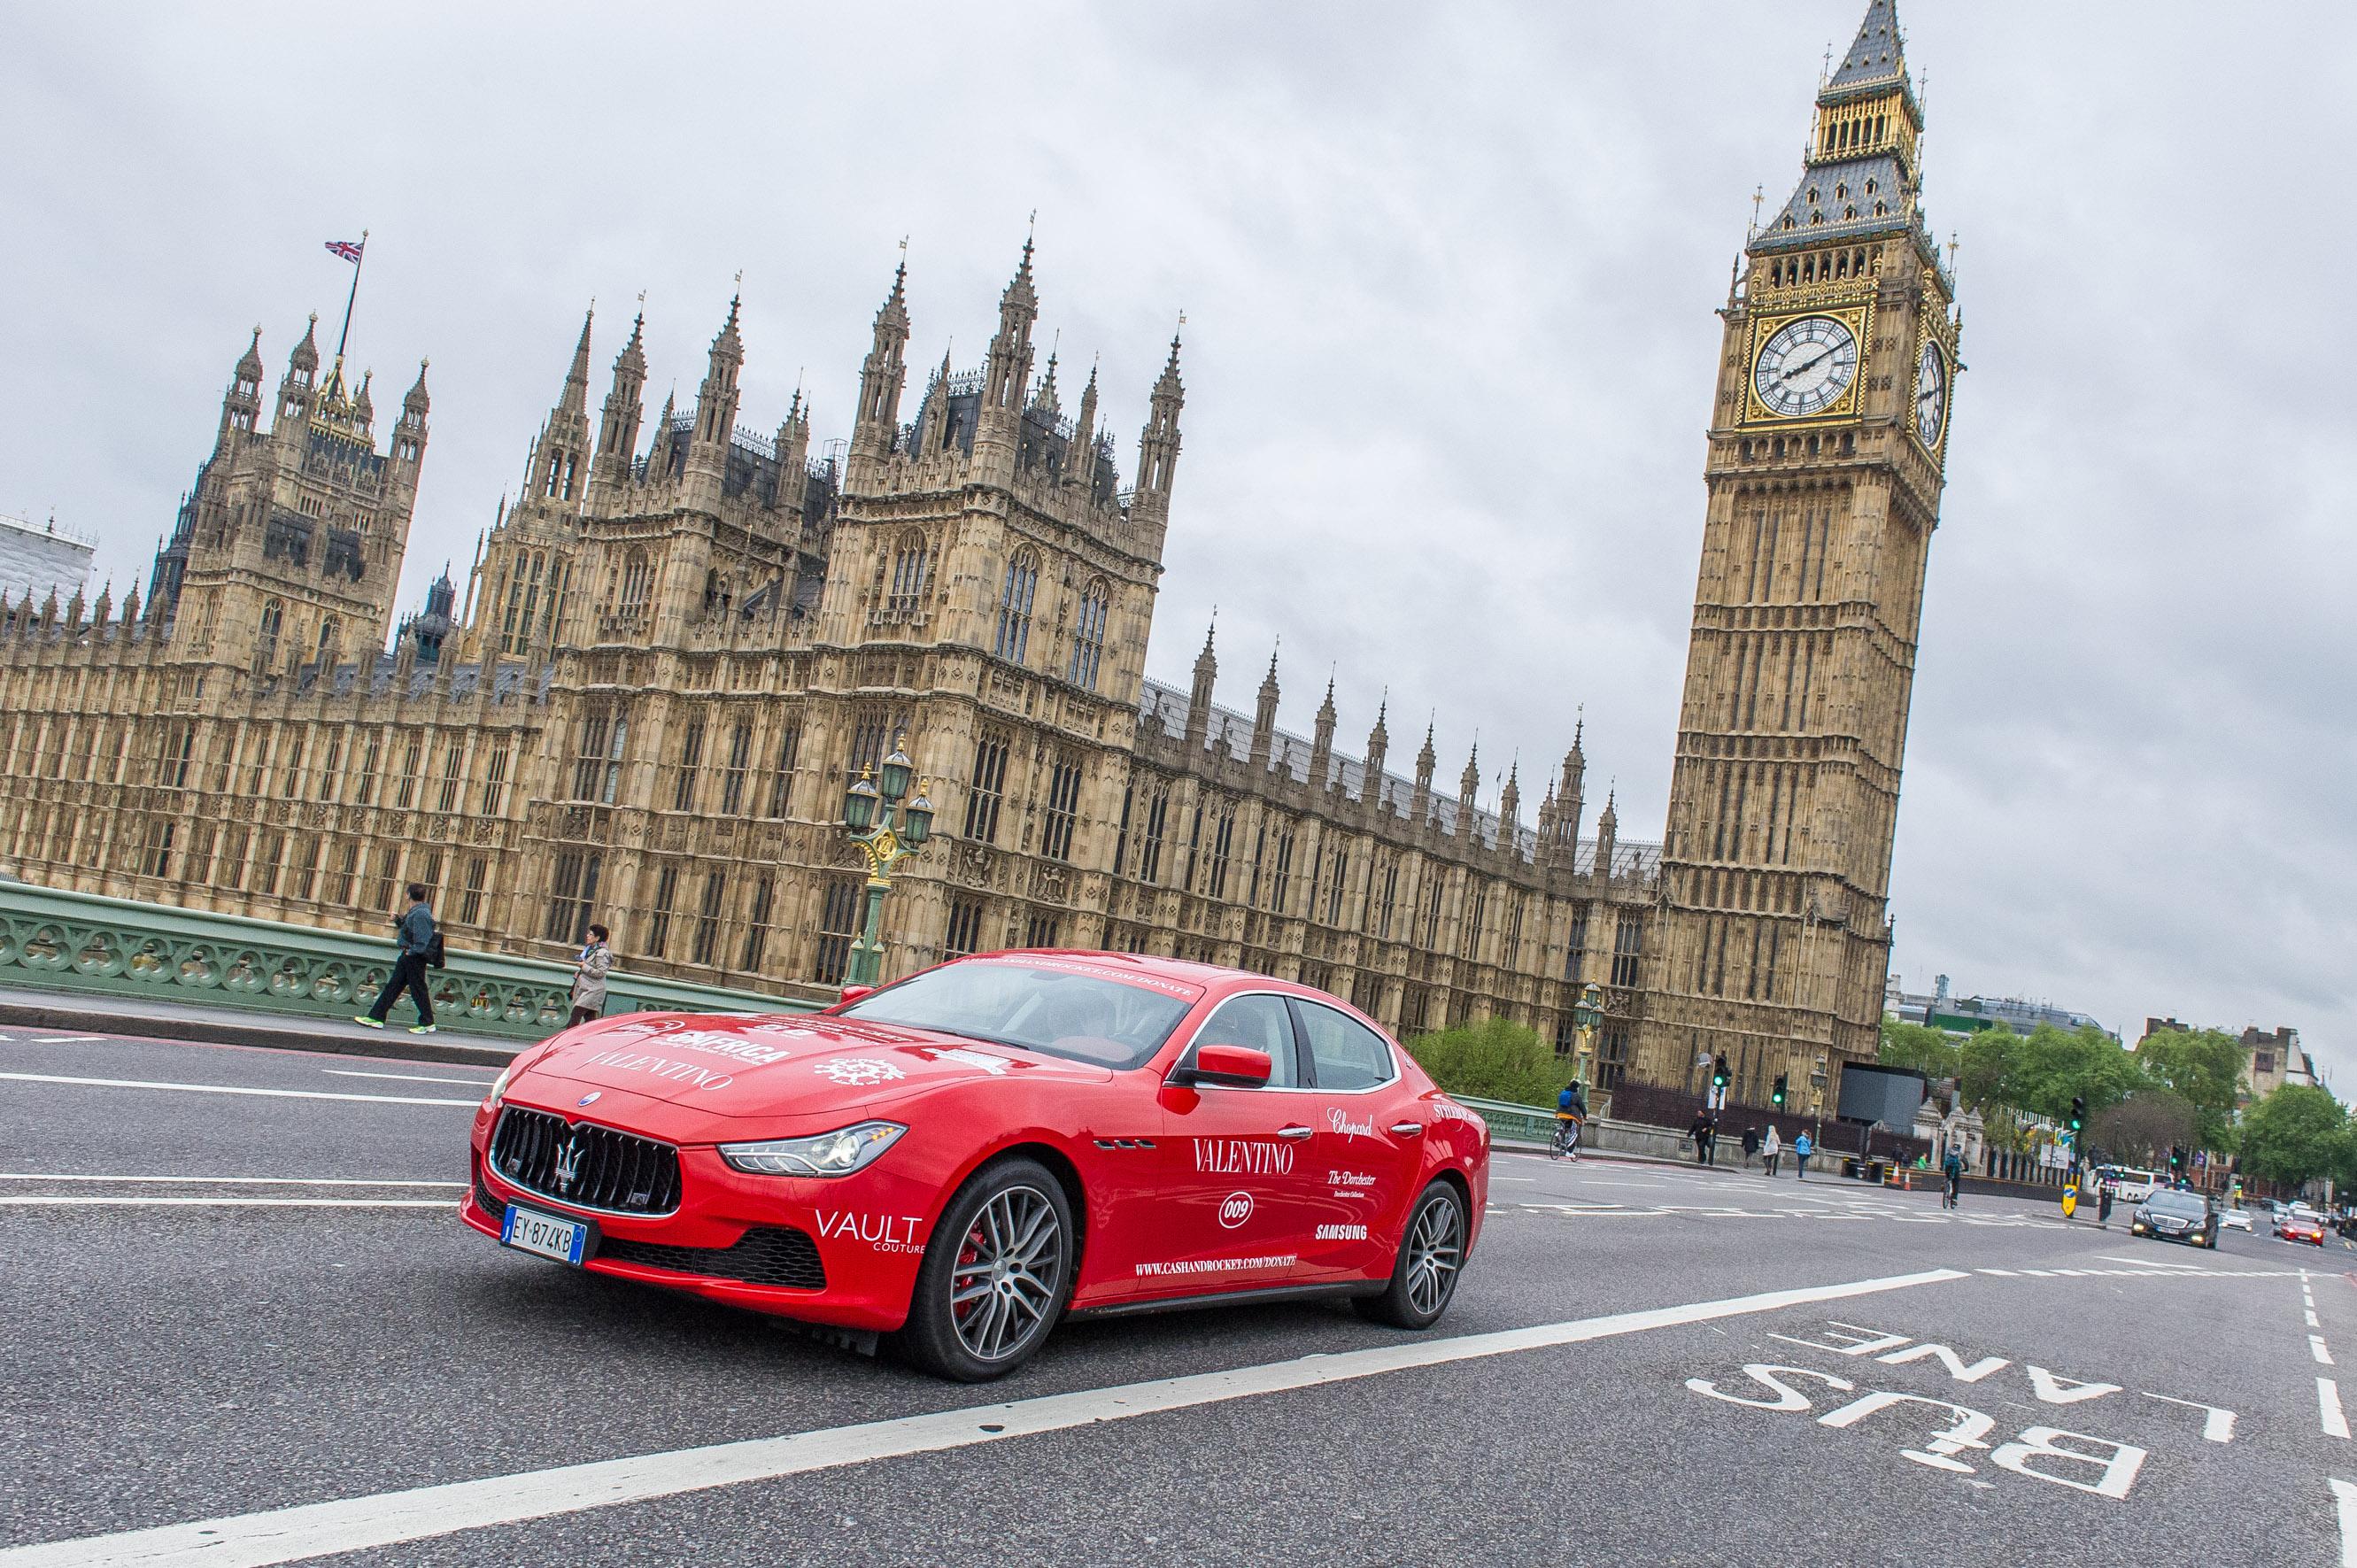 Maserati 9